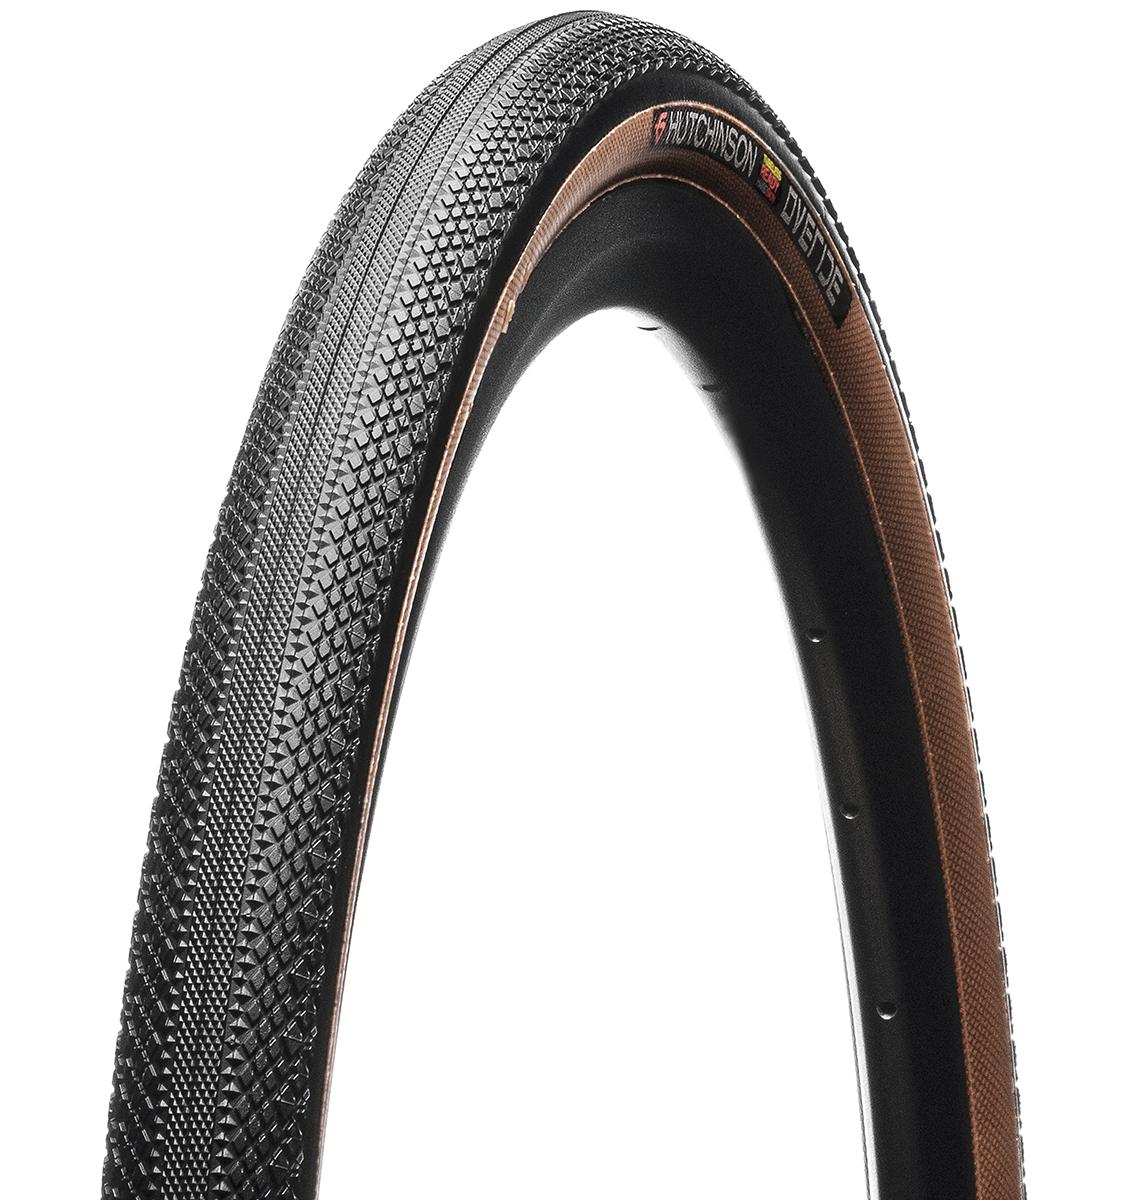 gravel-bike-tire-hutchinson-overide-2